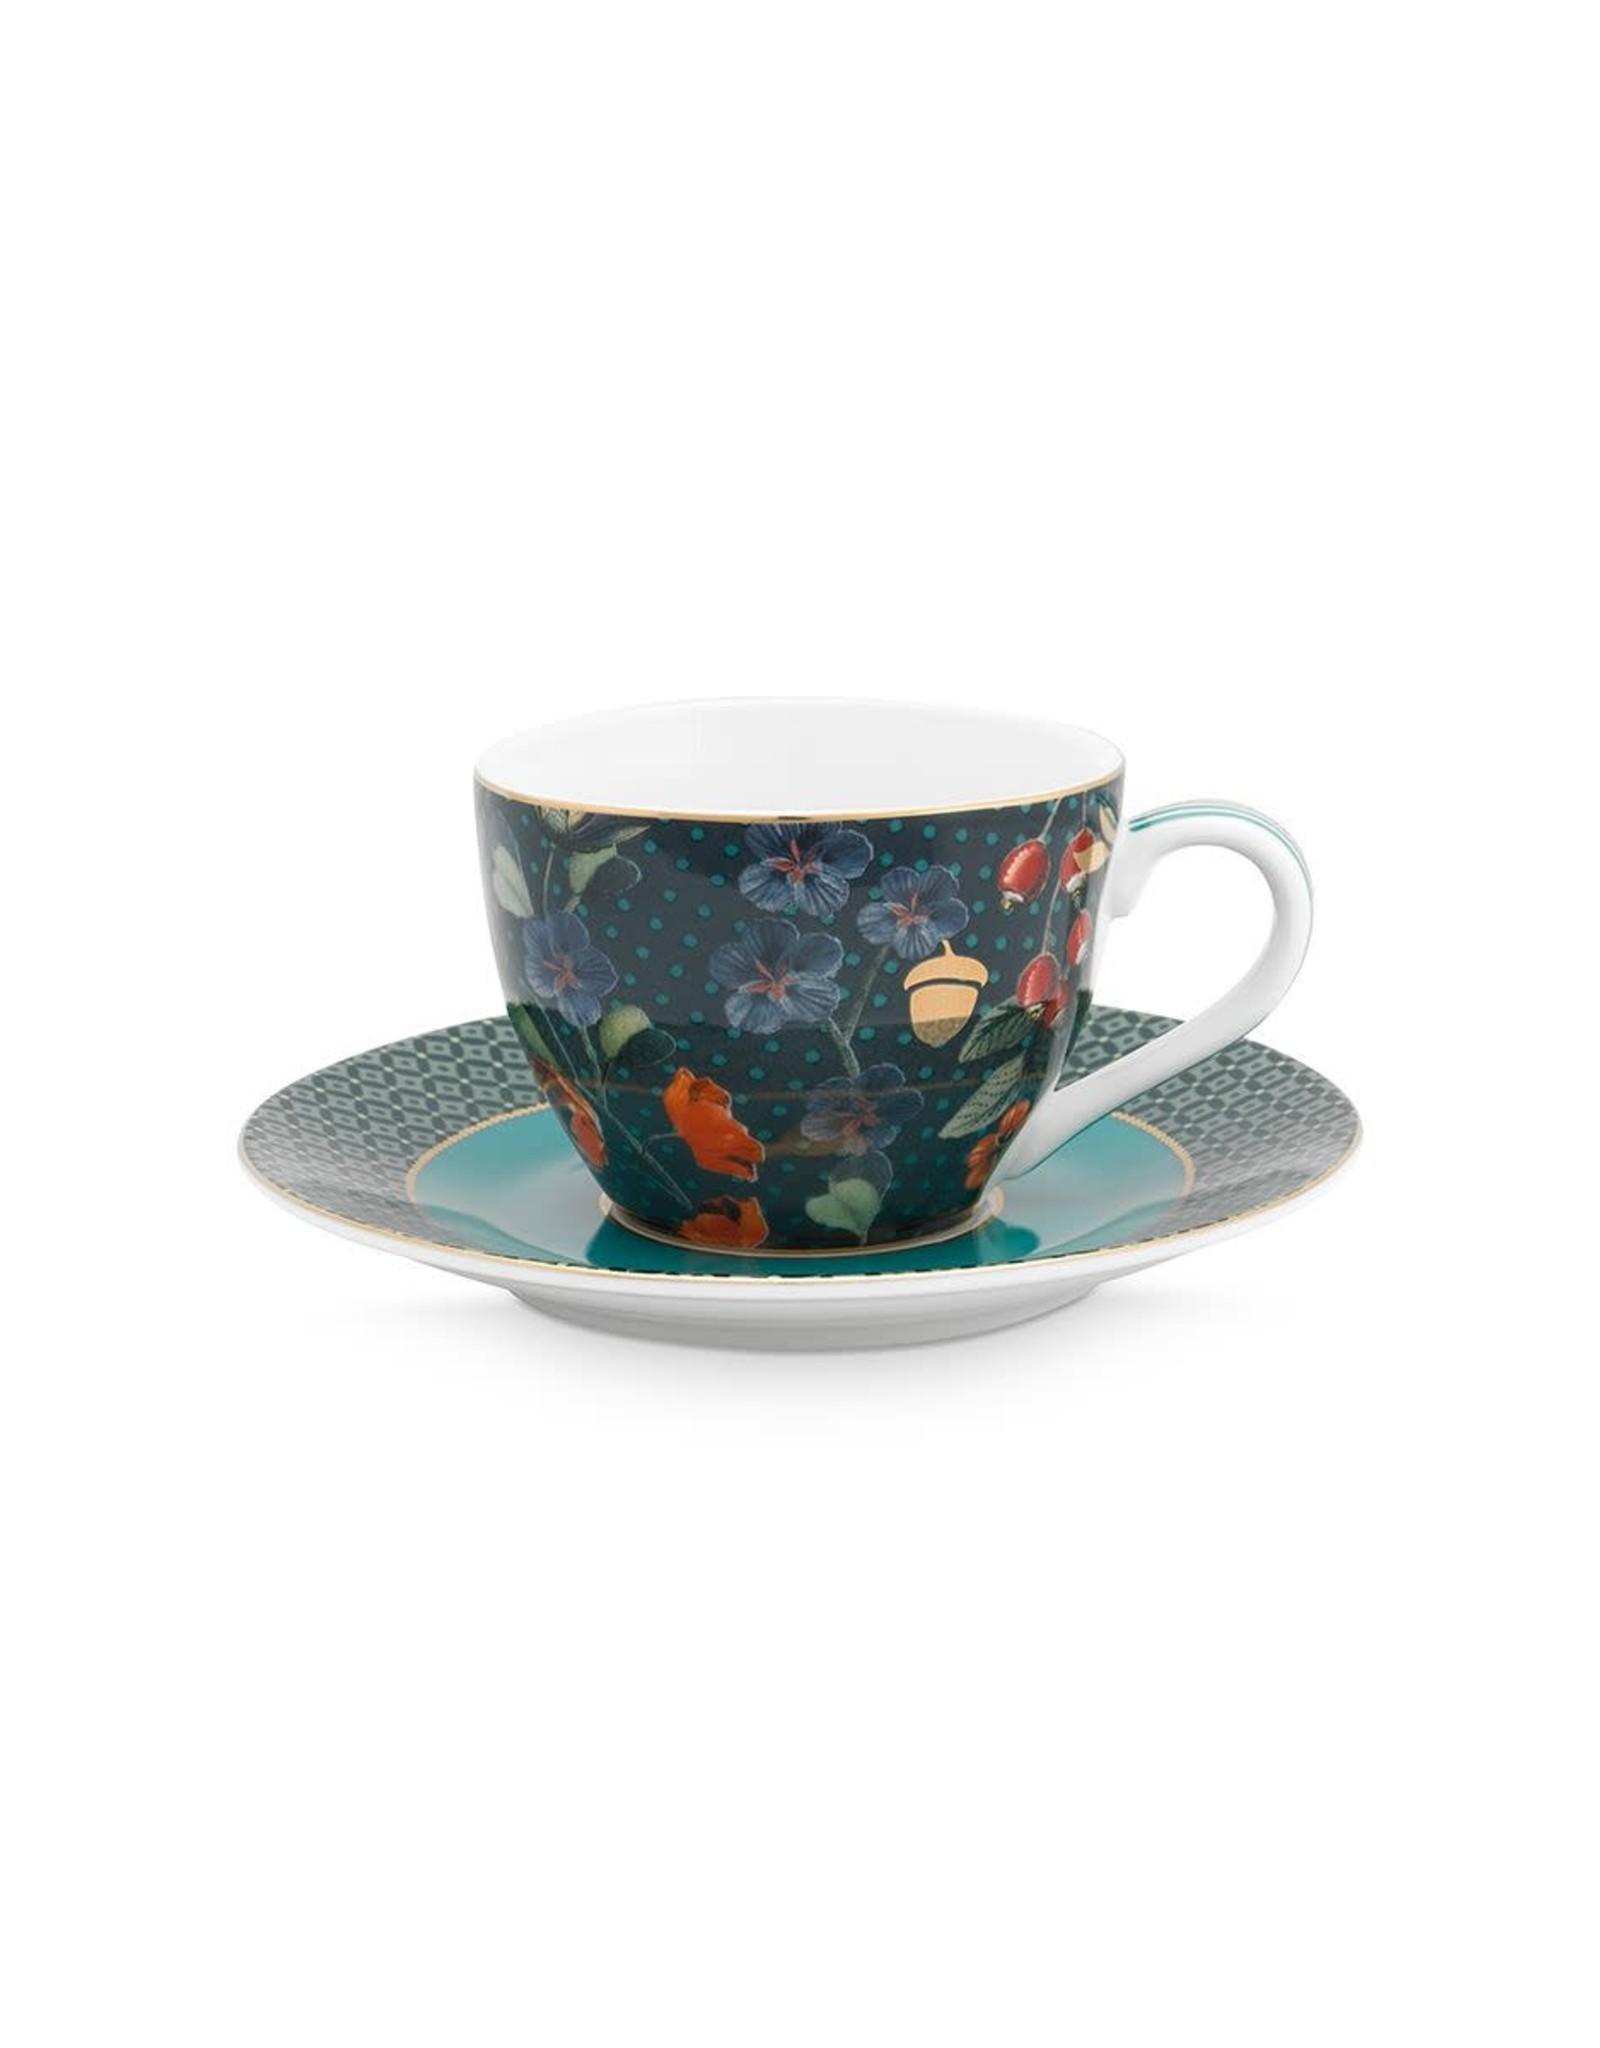 pip-studio Pip-studio. Espresso Cup & Saucer Winter Wonderland Overall Dark Blue